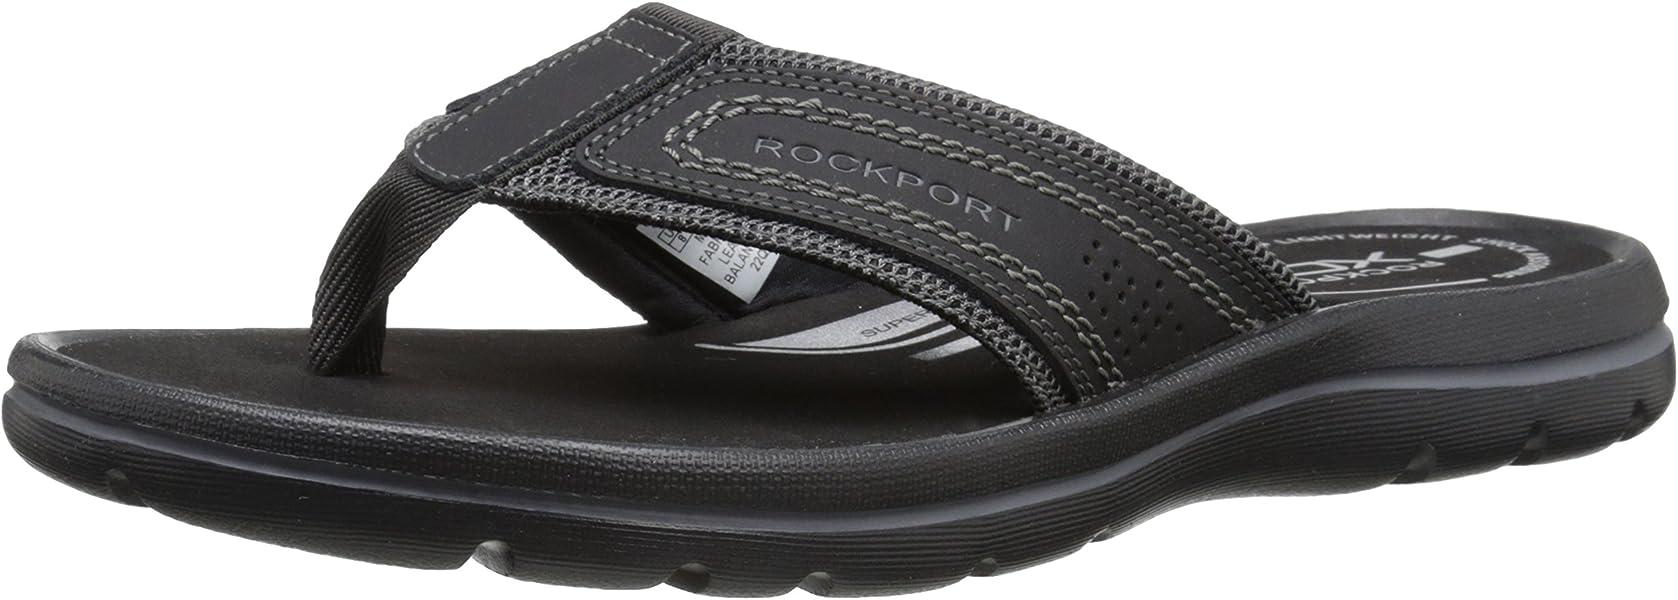 a03a5bca6b04 Rockport Men s Get Your Kicks Sandals Thong Black Grey 7 M (D)-